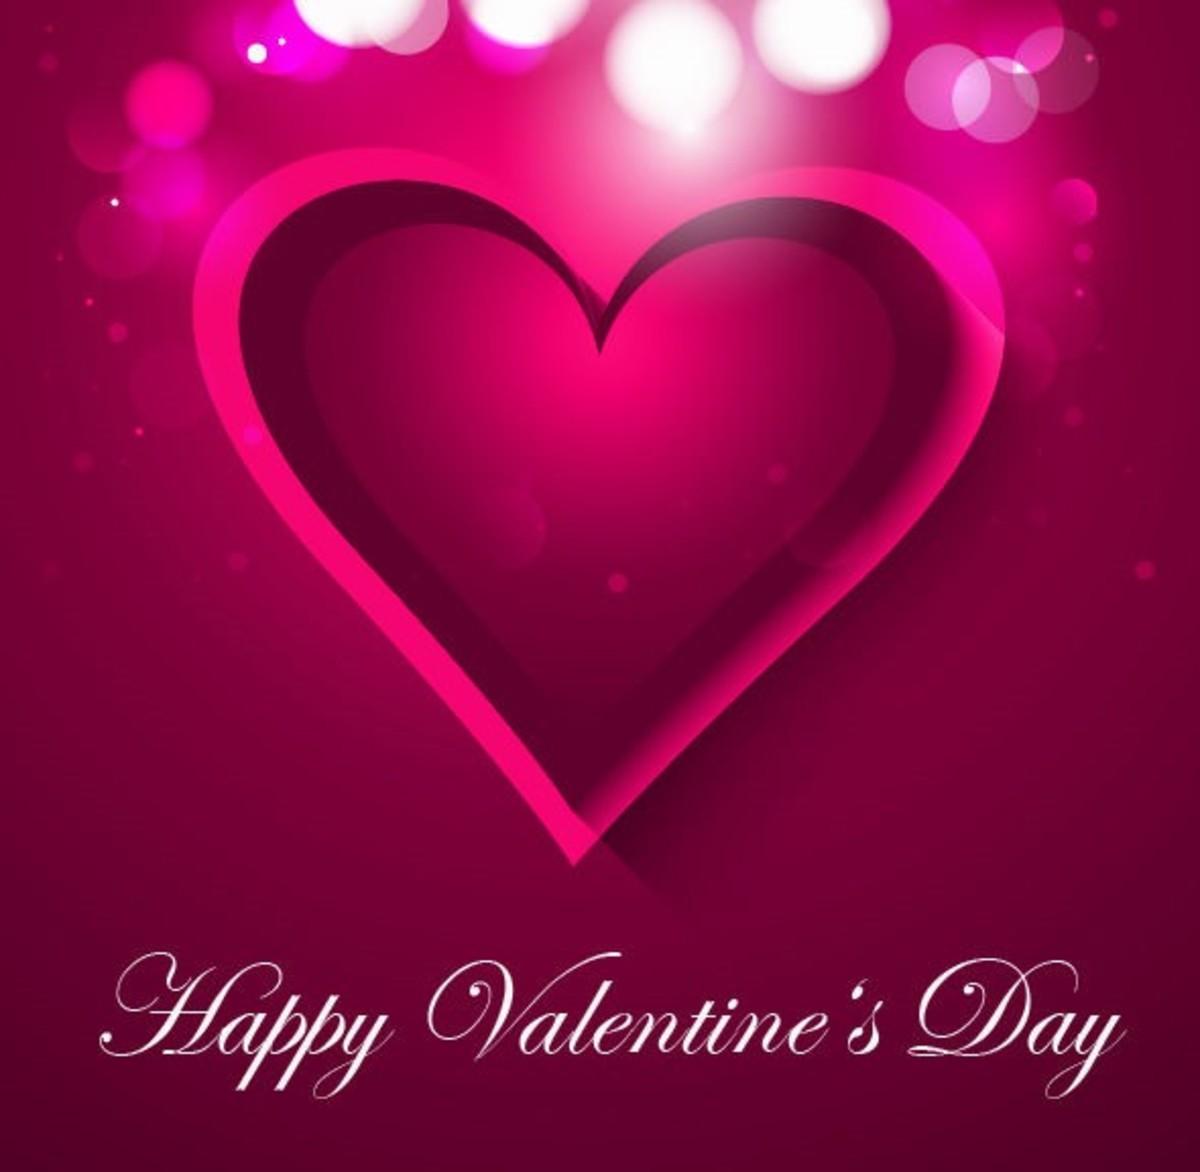 Happy Valentine's Day with Fuchsia Heart